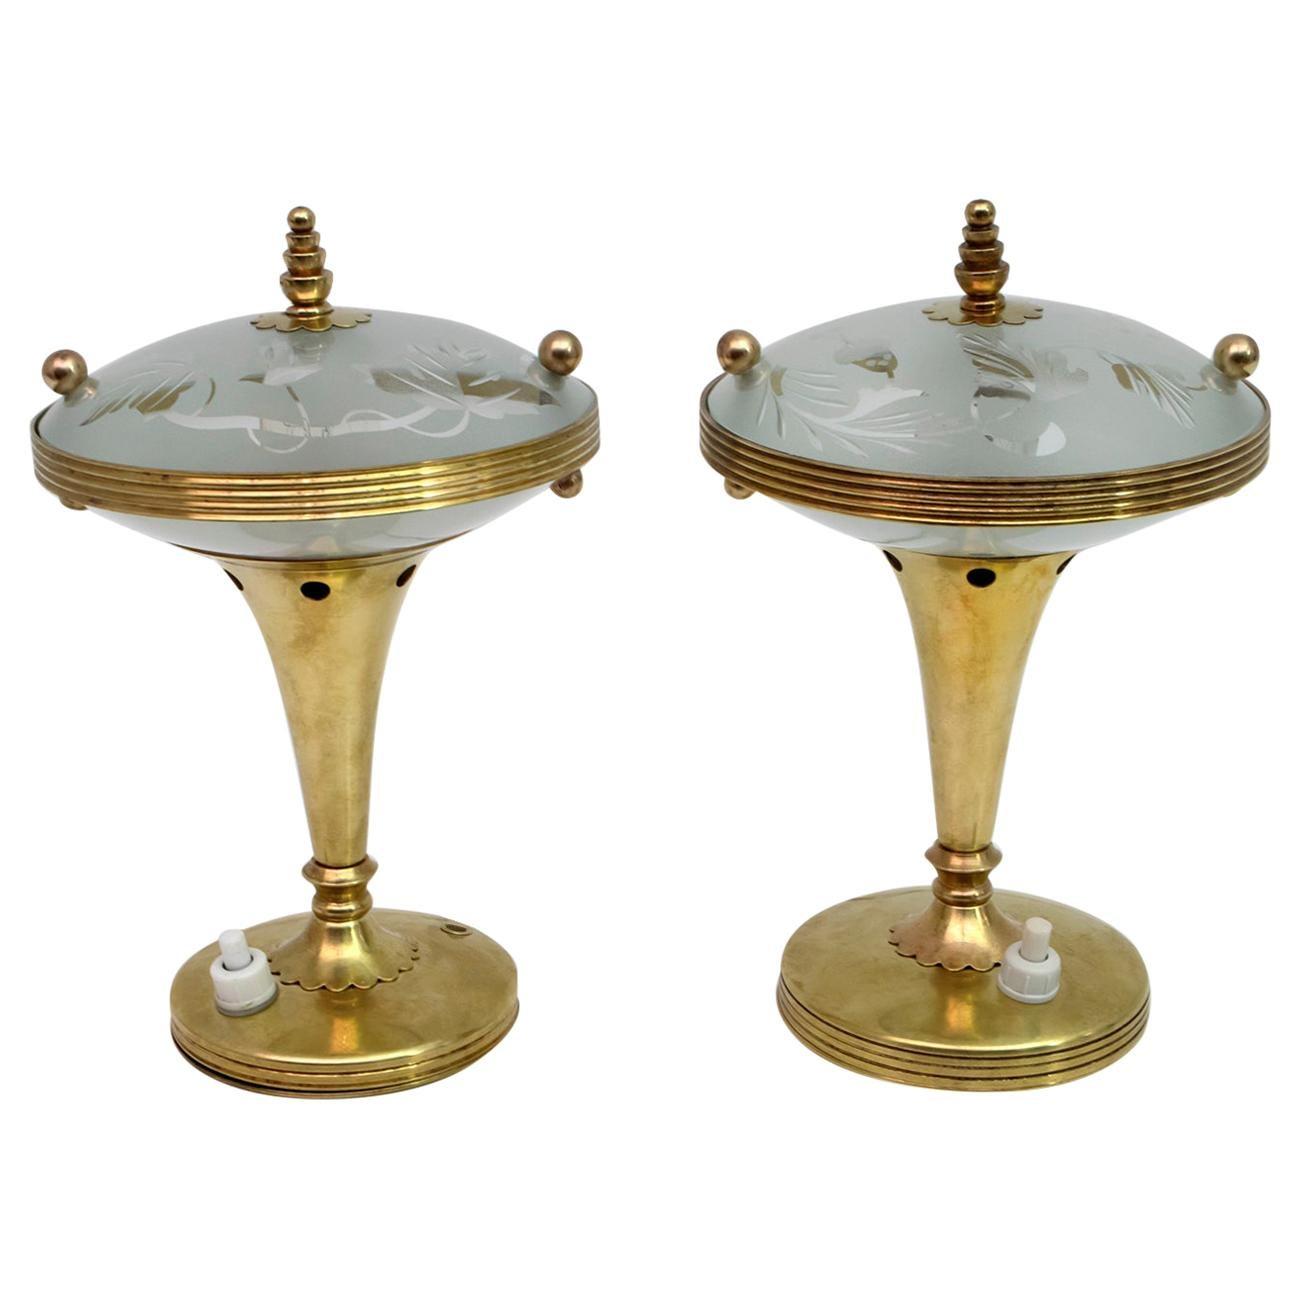 Pair of Pietro Chiesa Midcentury Italian Brass Table Lamps by Fontana Arte 1940s